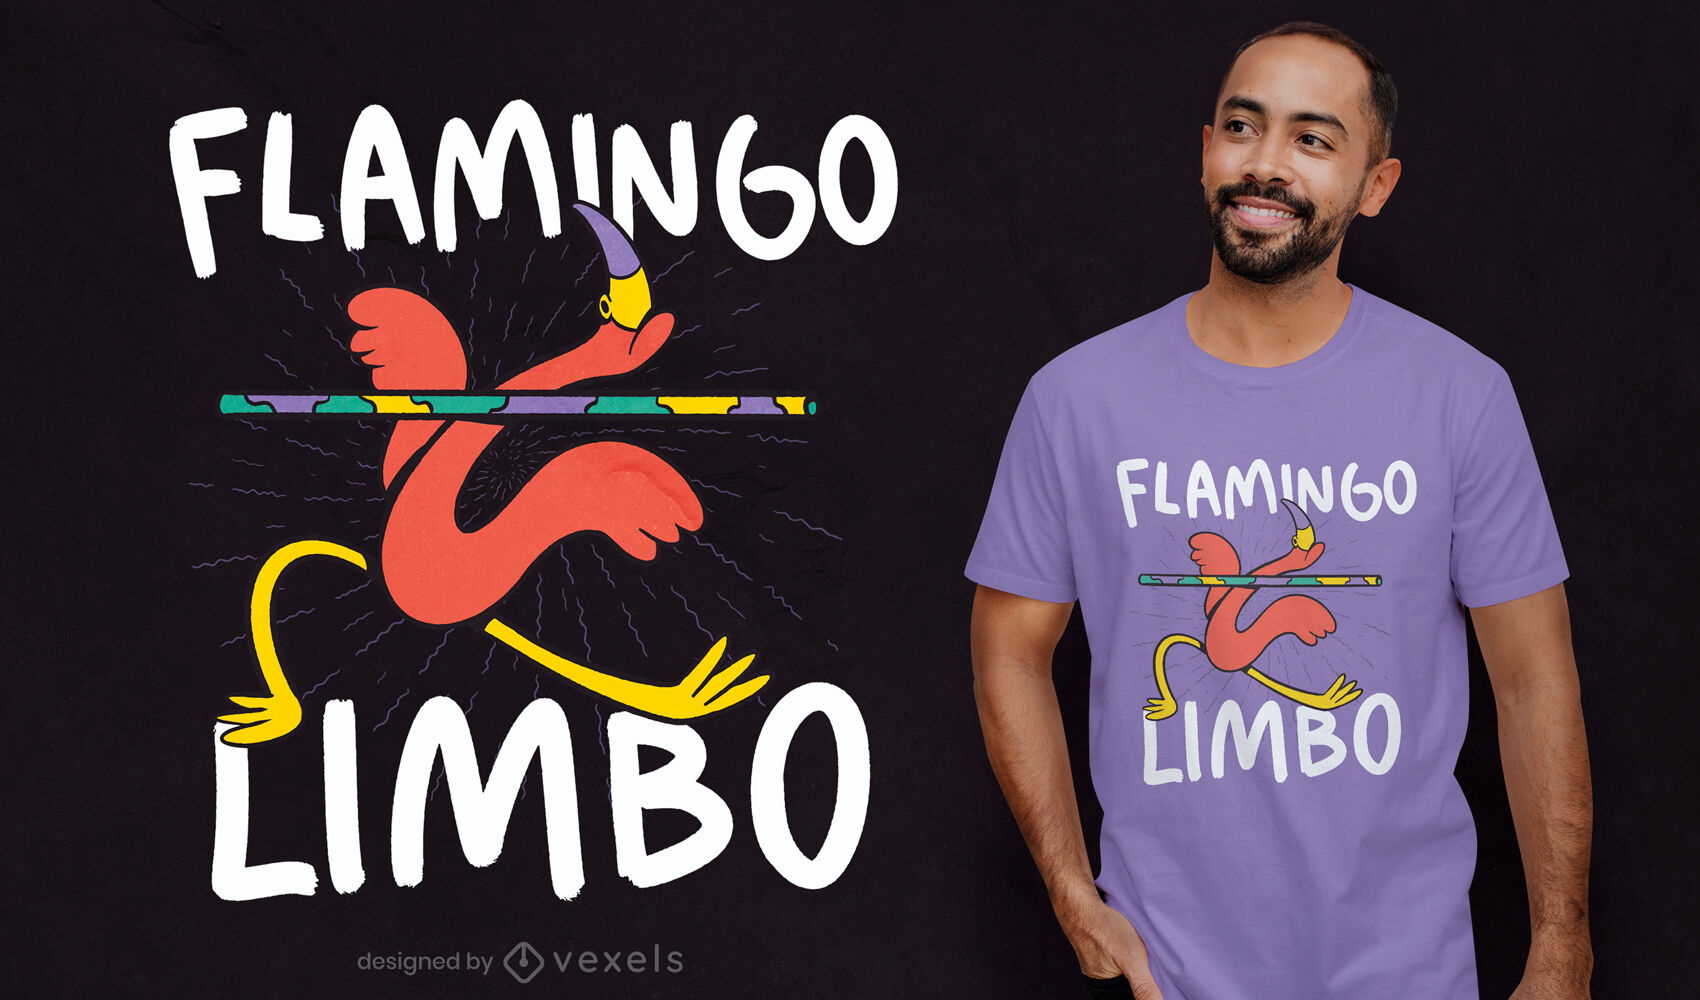 Diseño de camiseta flamingo limbo dance